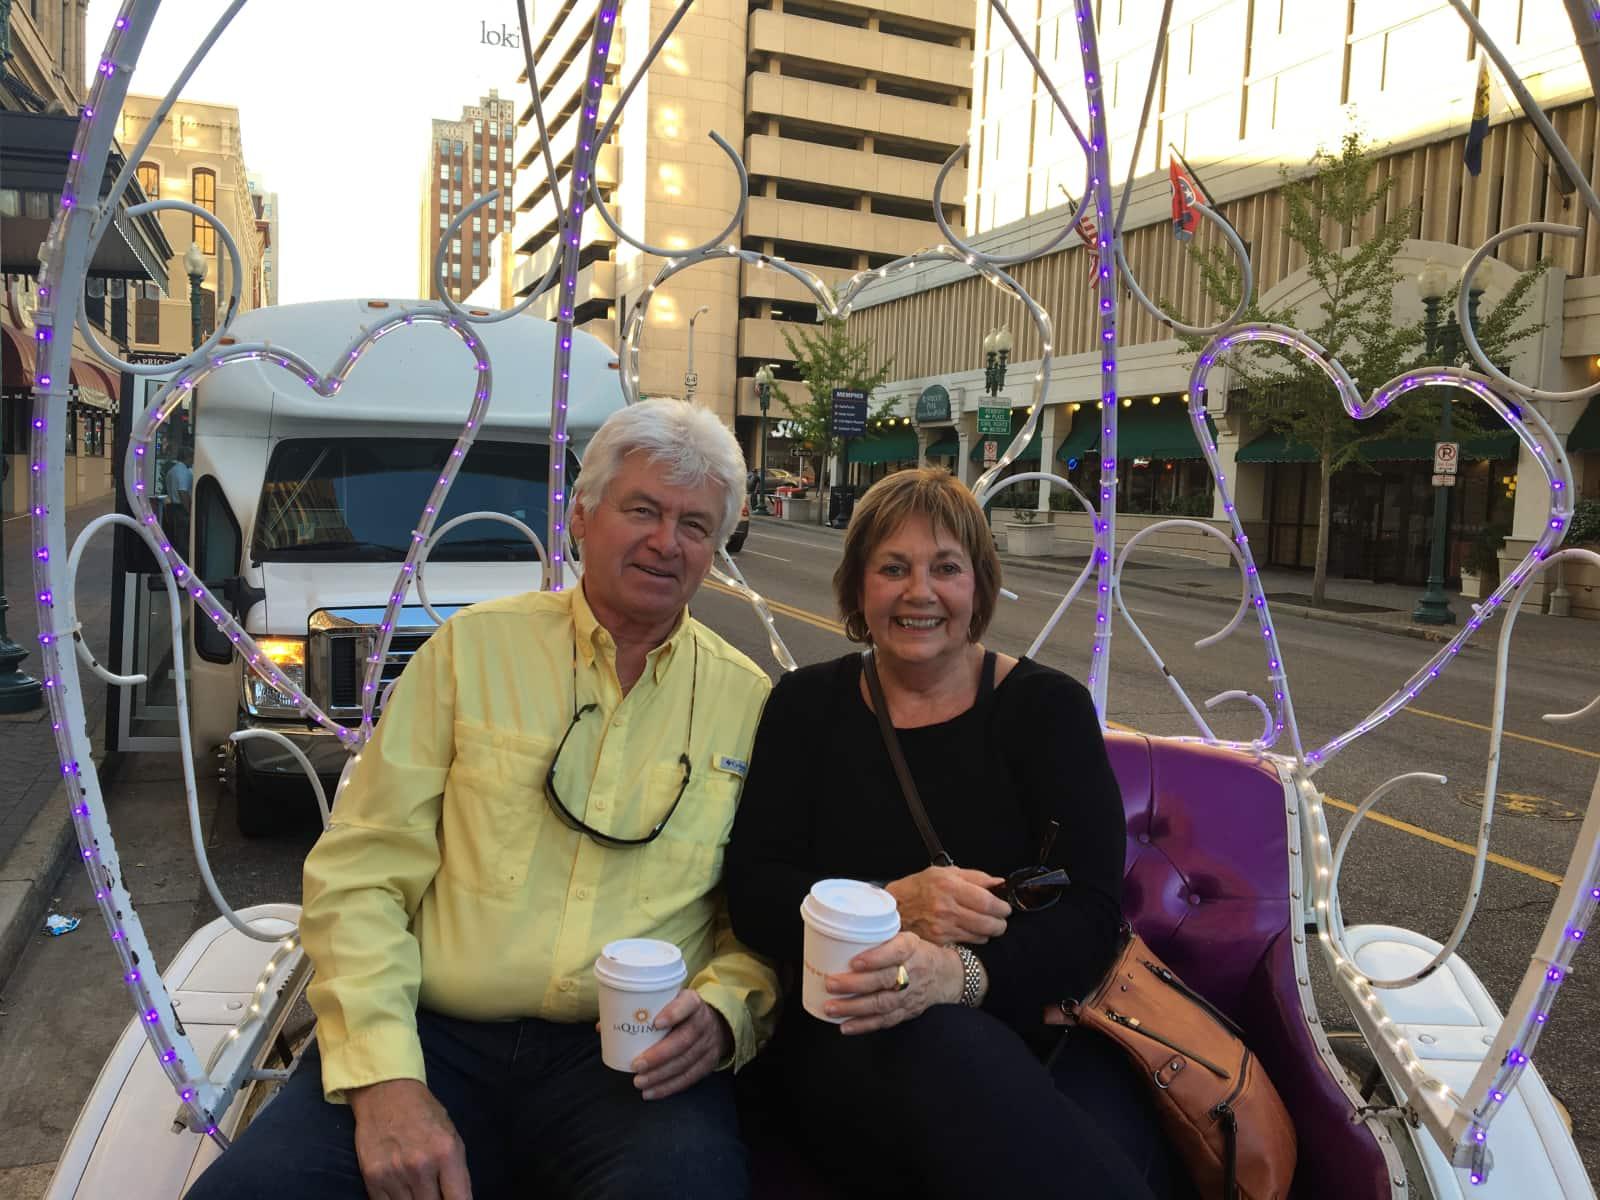 Terry & Bev from Orillia, Ontario, Canada